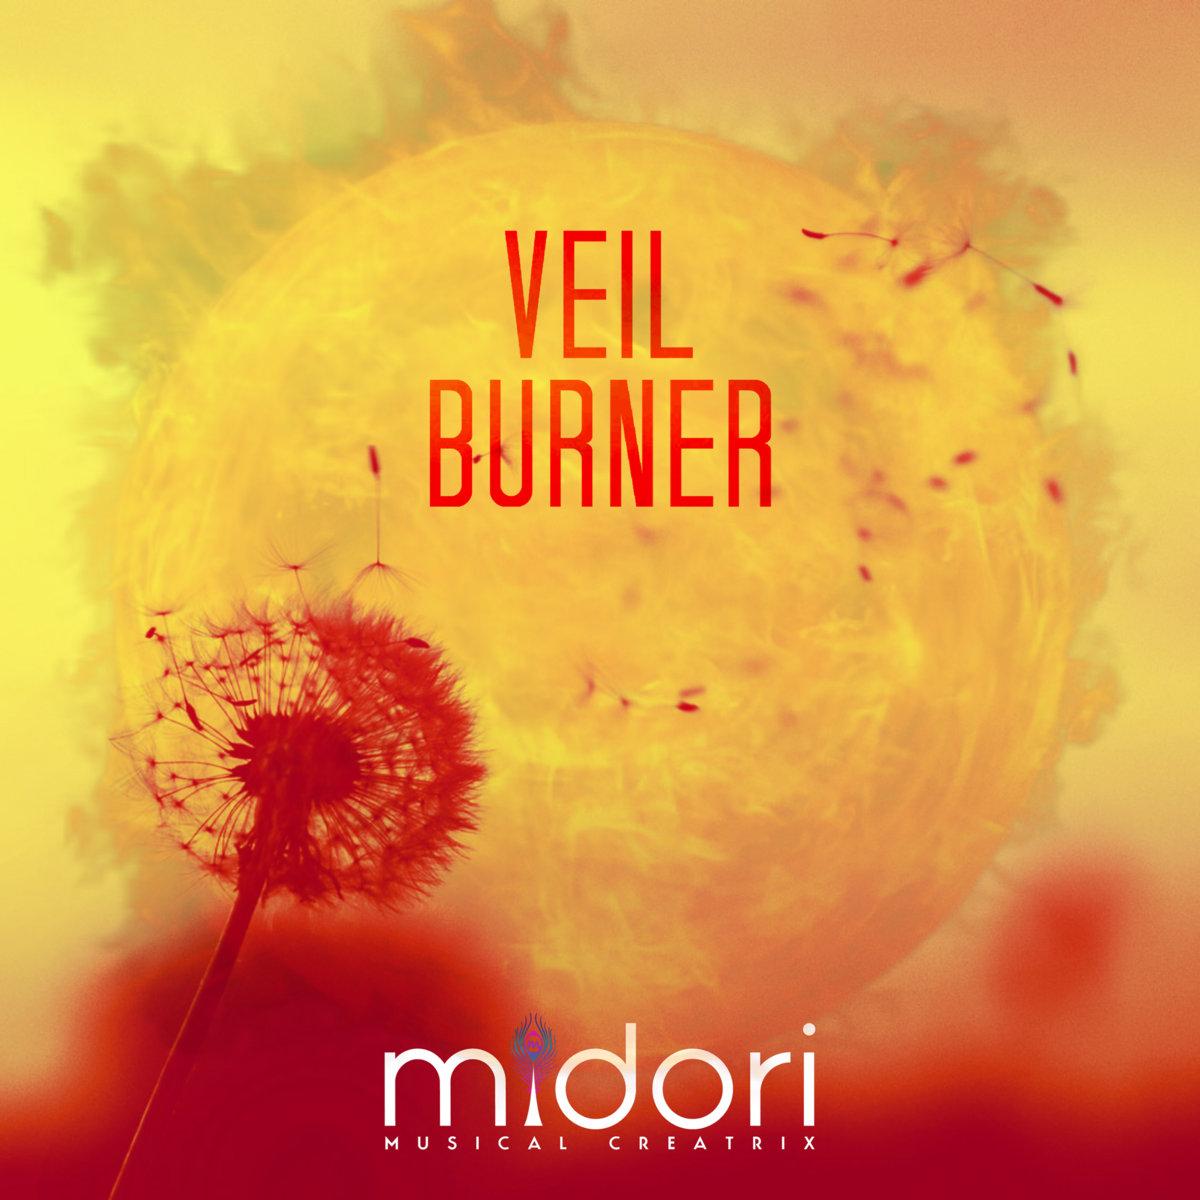 Veil Burner by Midori